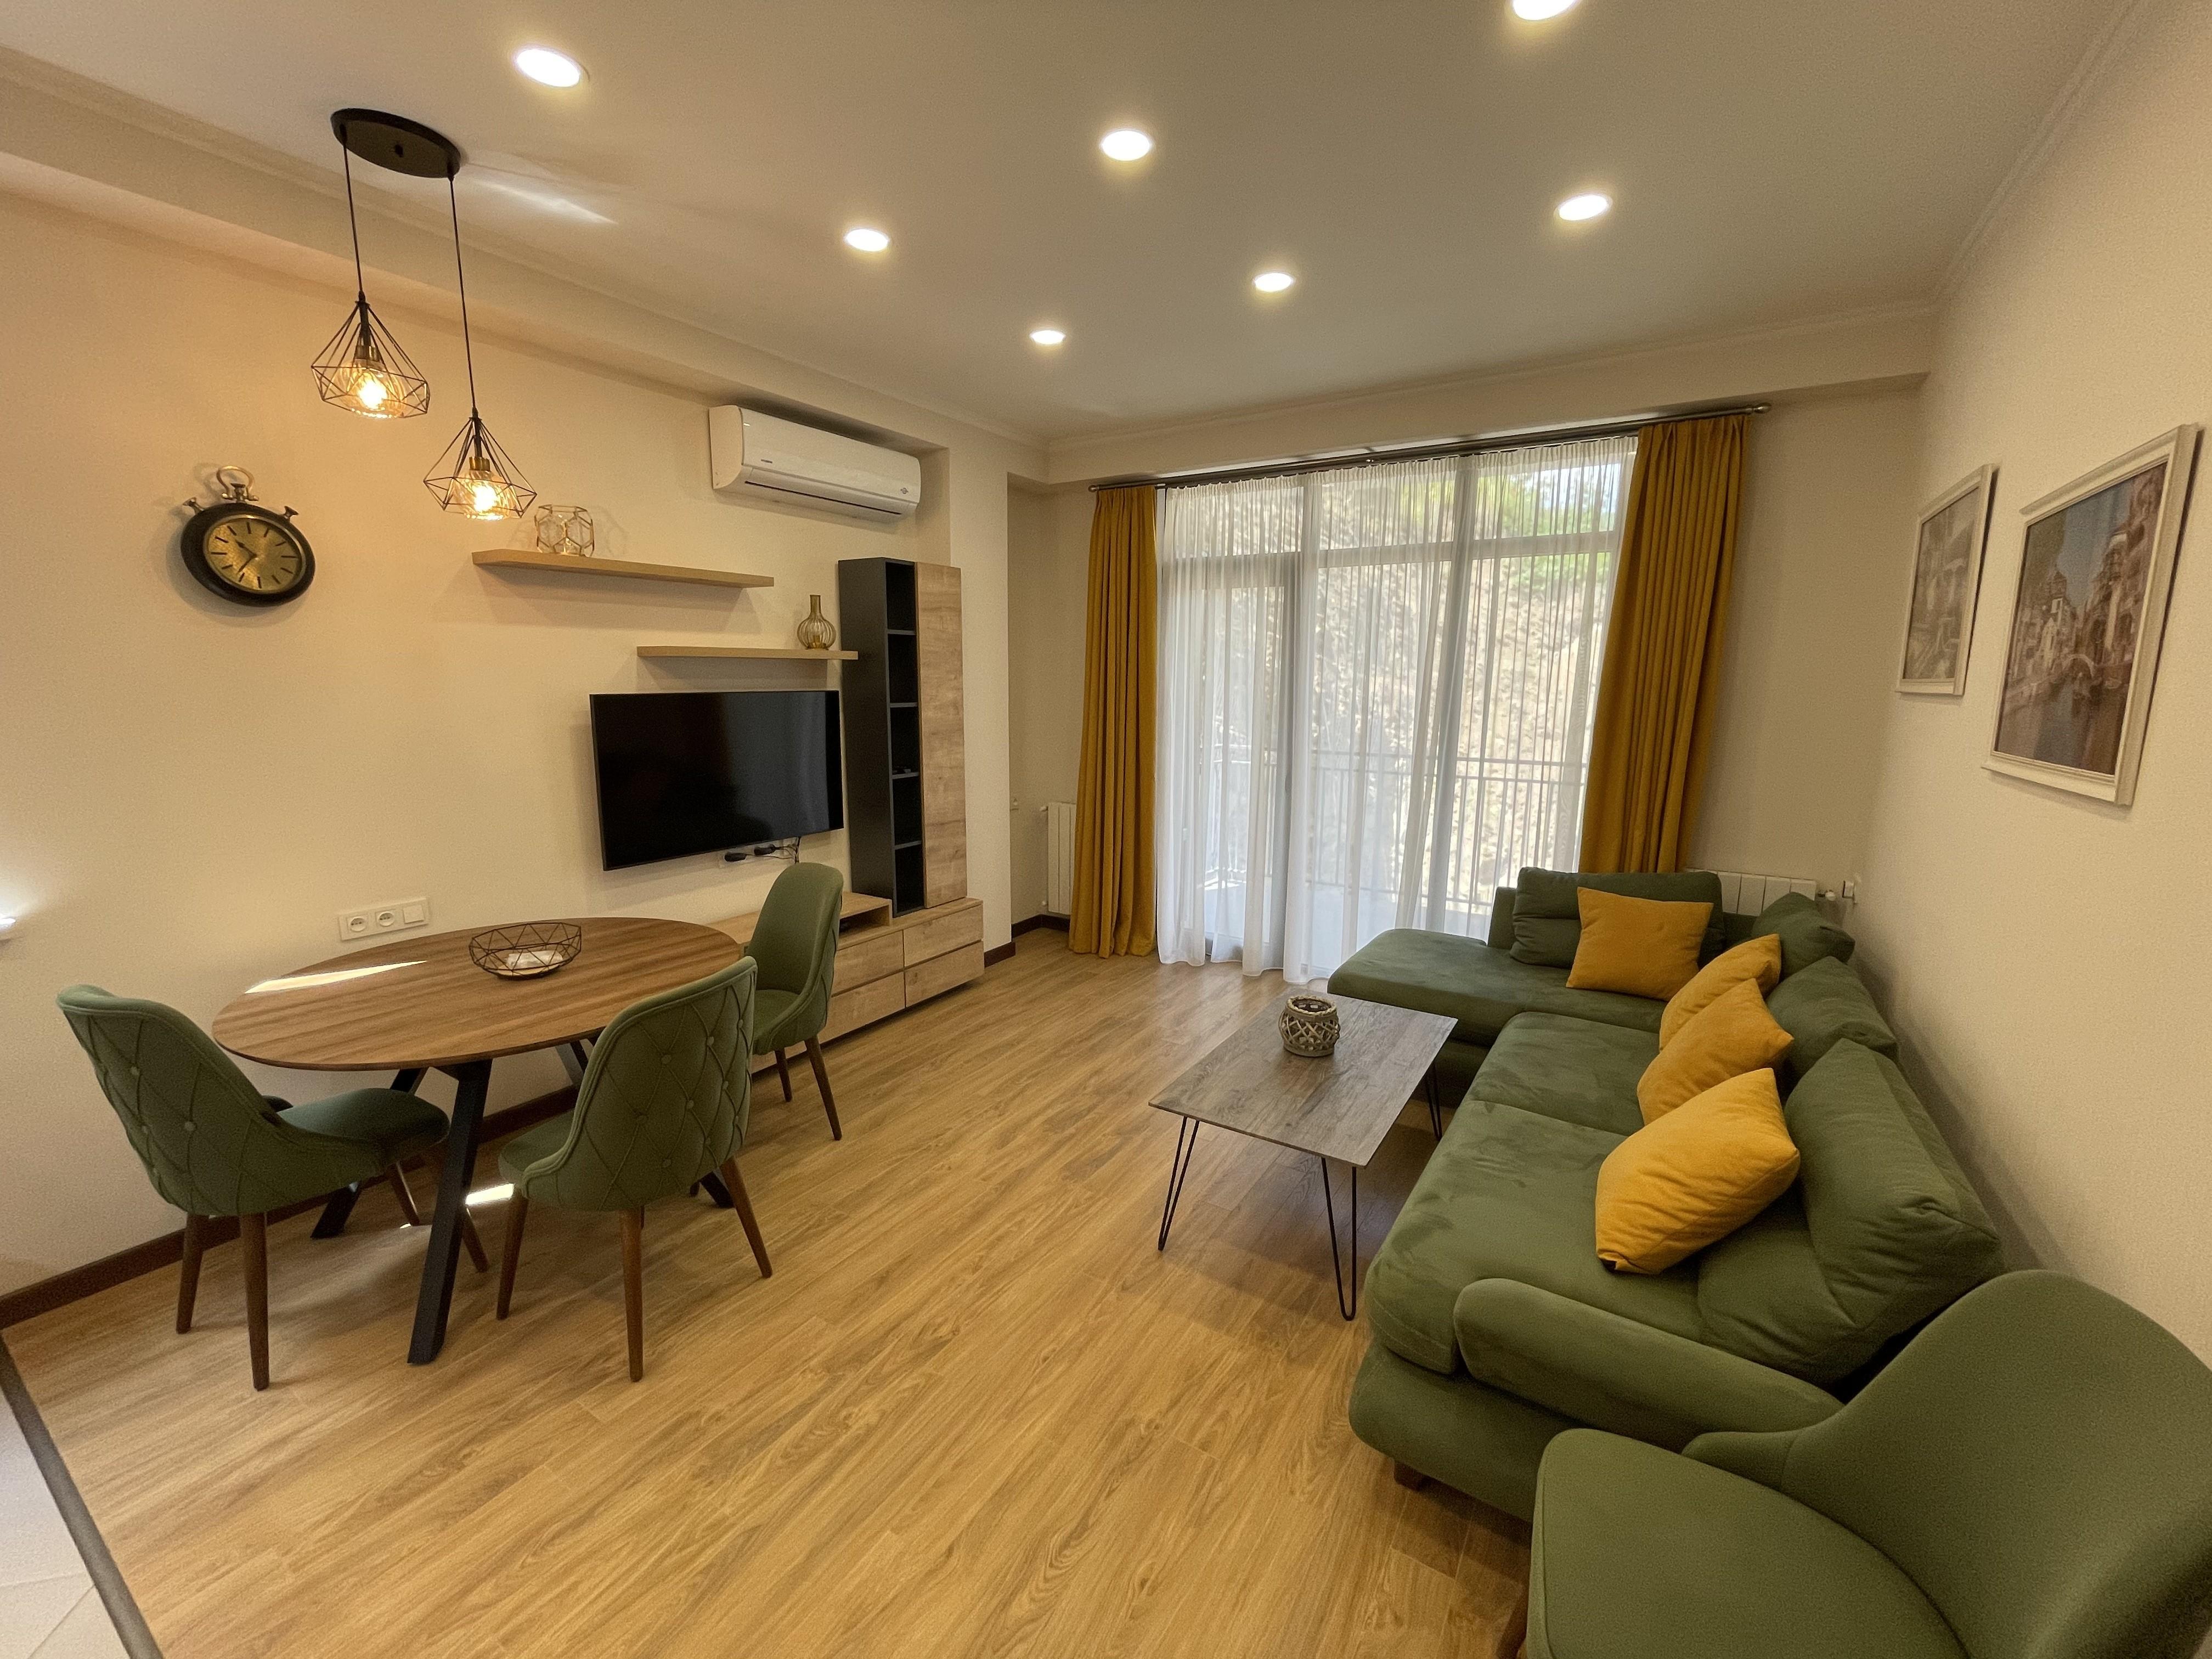 3-Room Apartment For Rent in Vake, on Marukhis Gmirebi Street